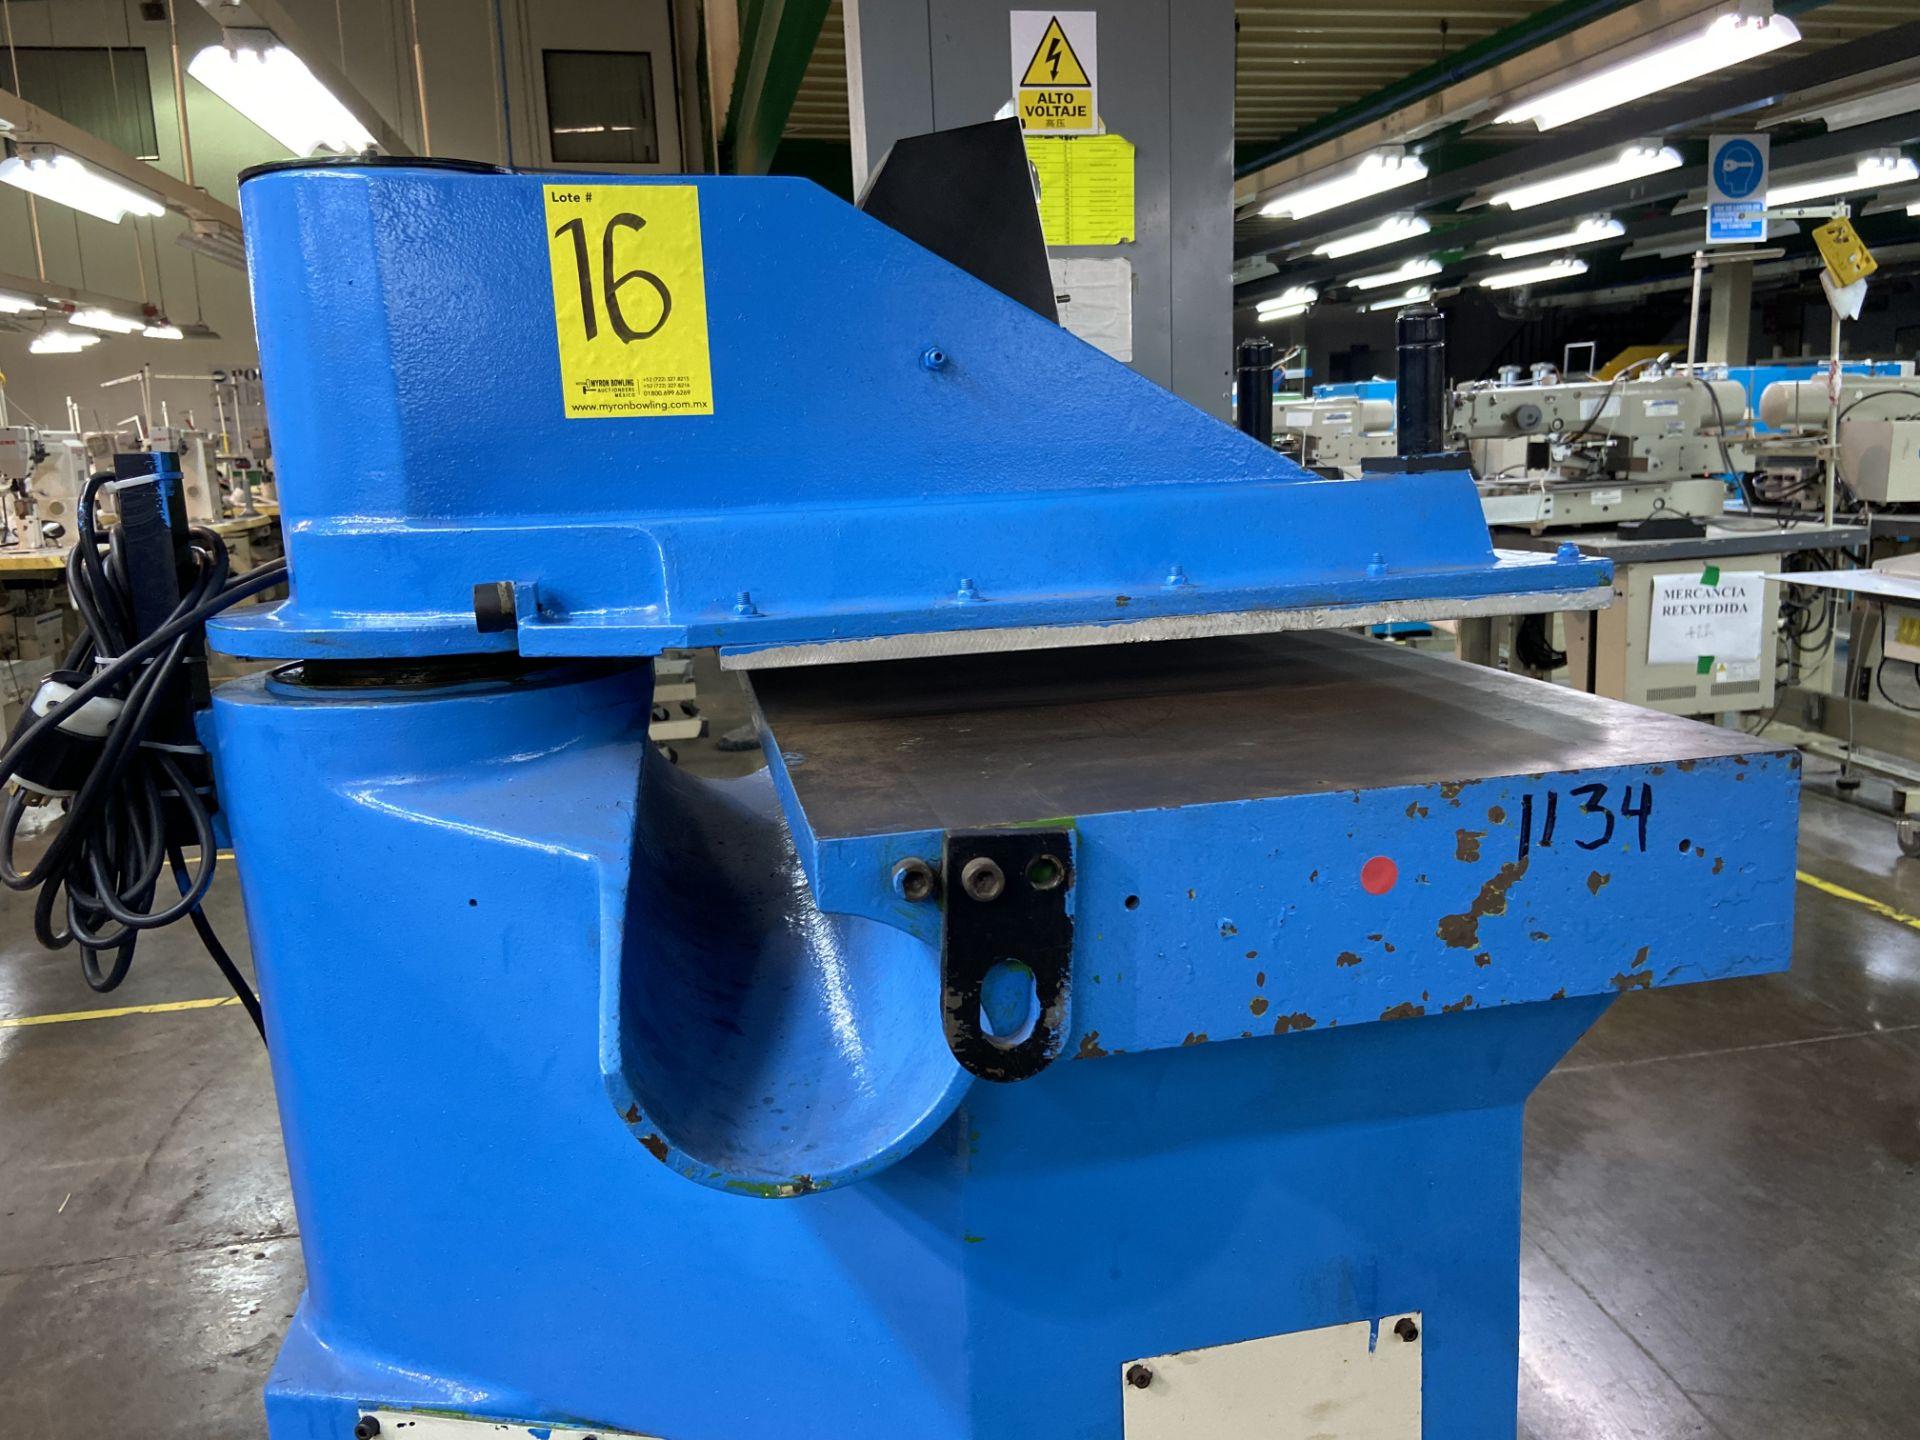 Lot 16 - (2) Prensas de corte hidráulica de brazo oscilante, marca Ying Hui Machine, Modelo: YG-520